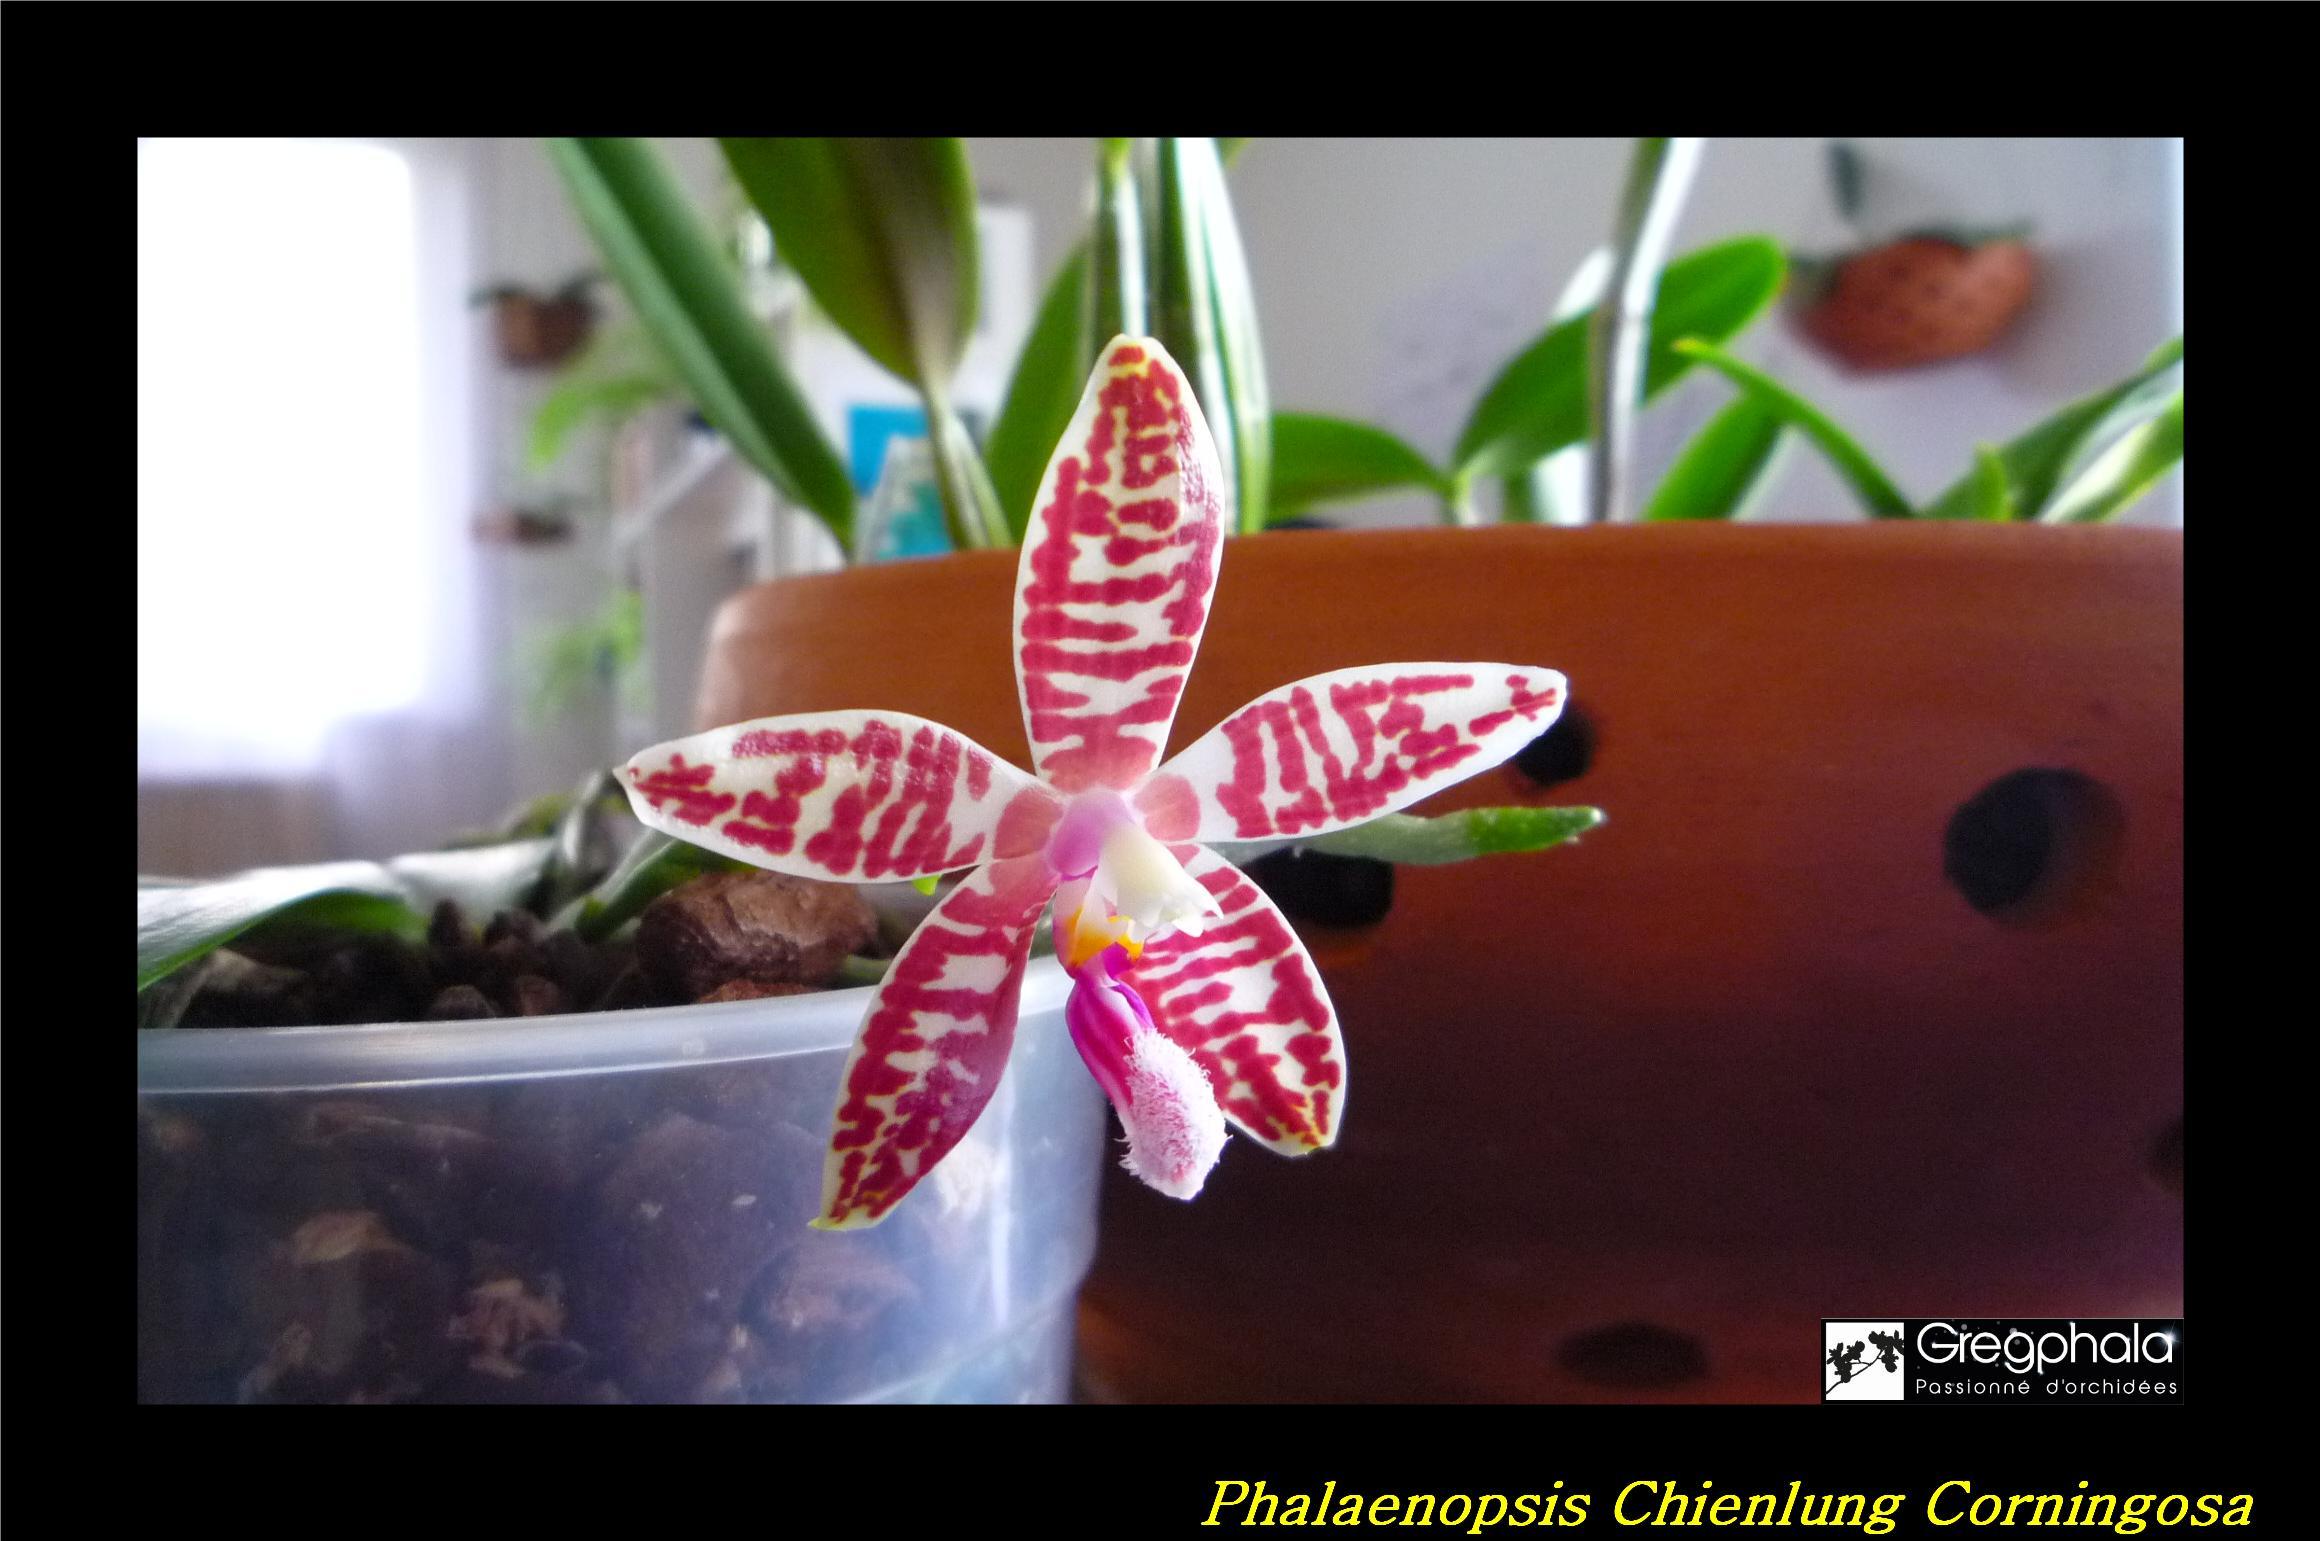 Phalaenopsis Chienlung Corningosa 17032301054517991314940077